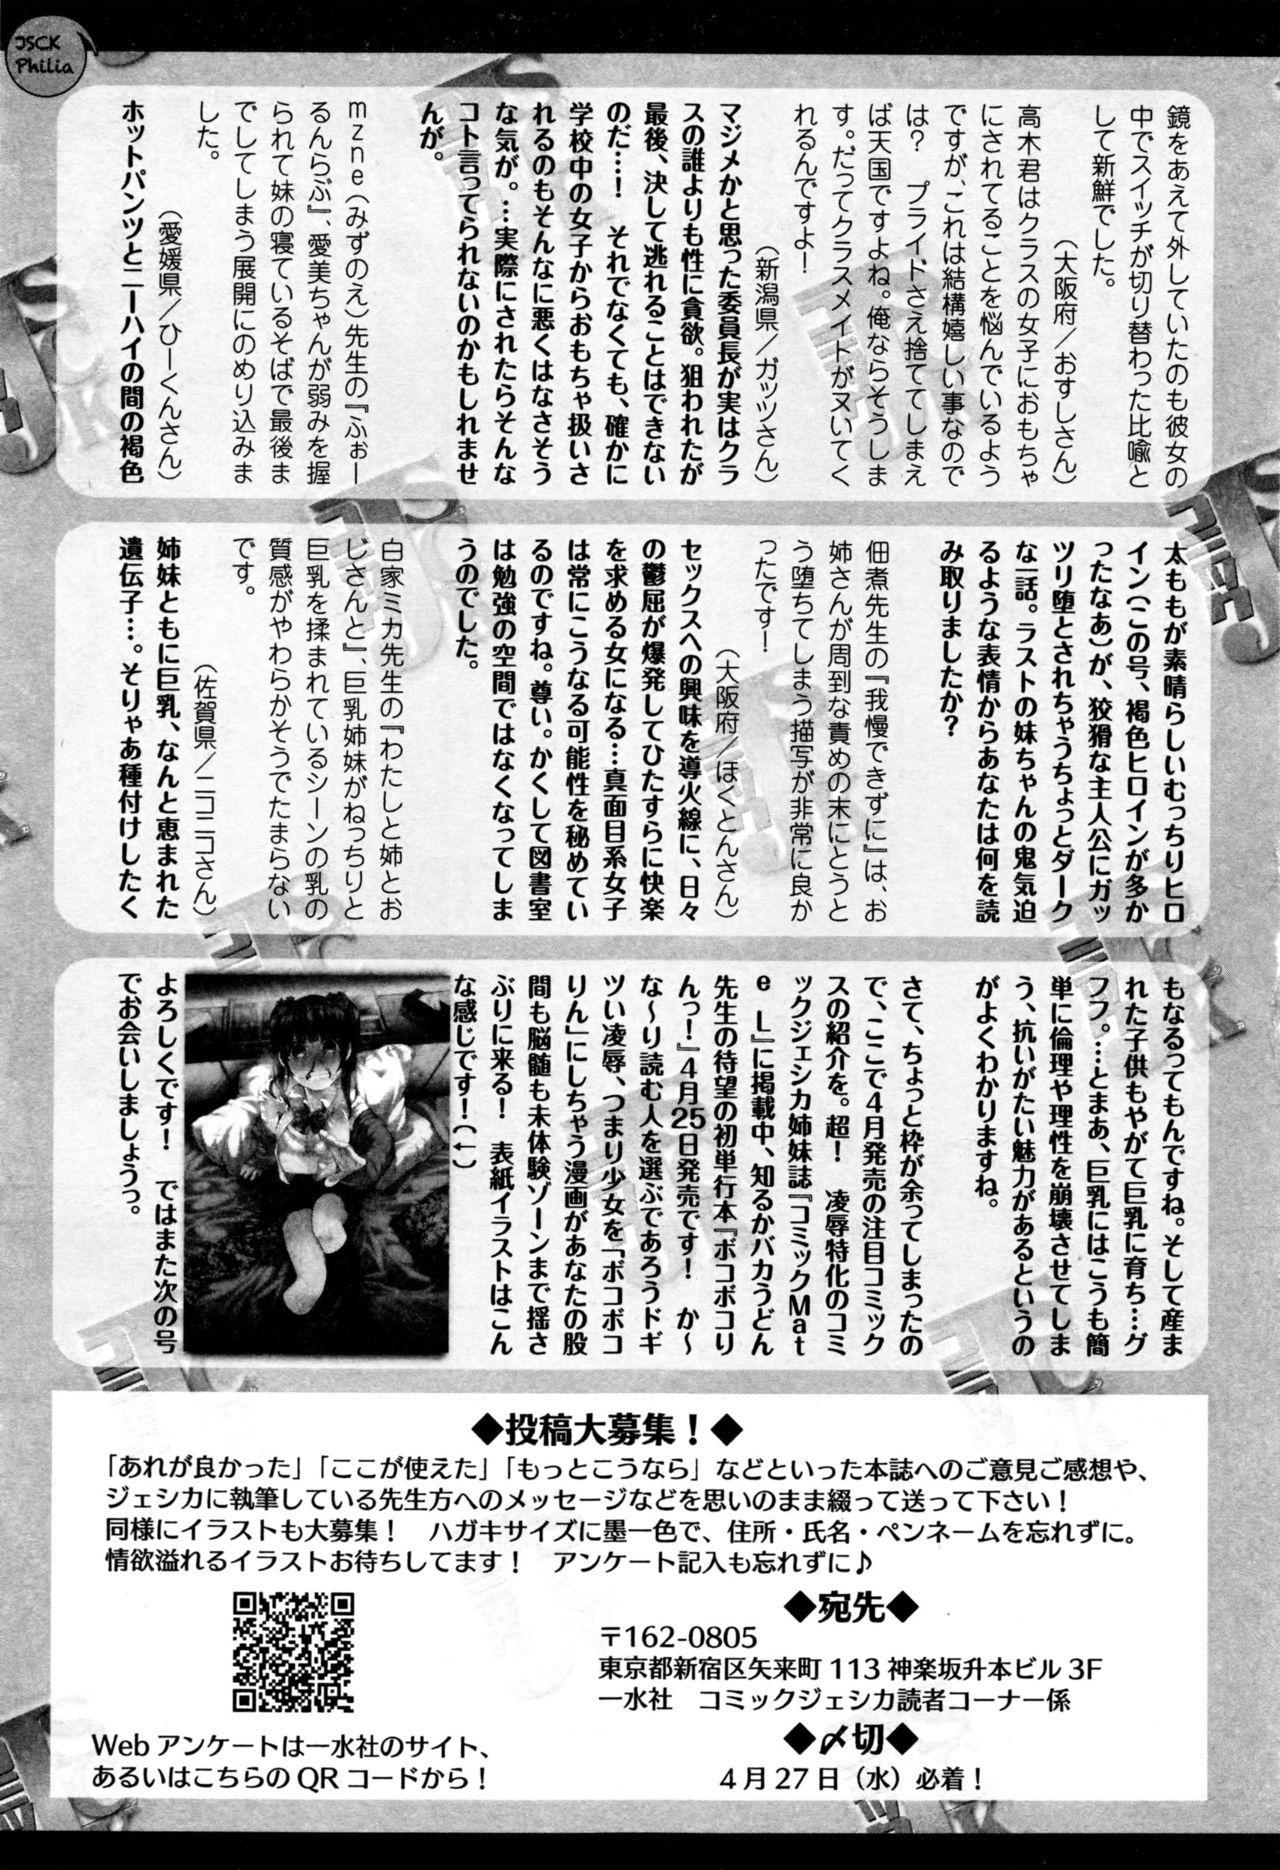 Comic JSCK Vol.4 2016-05 279